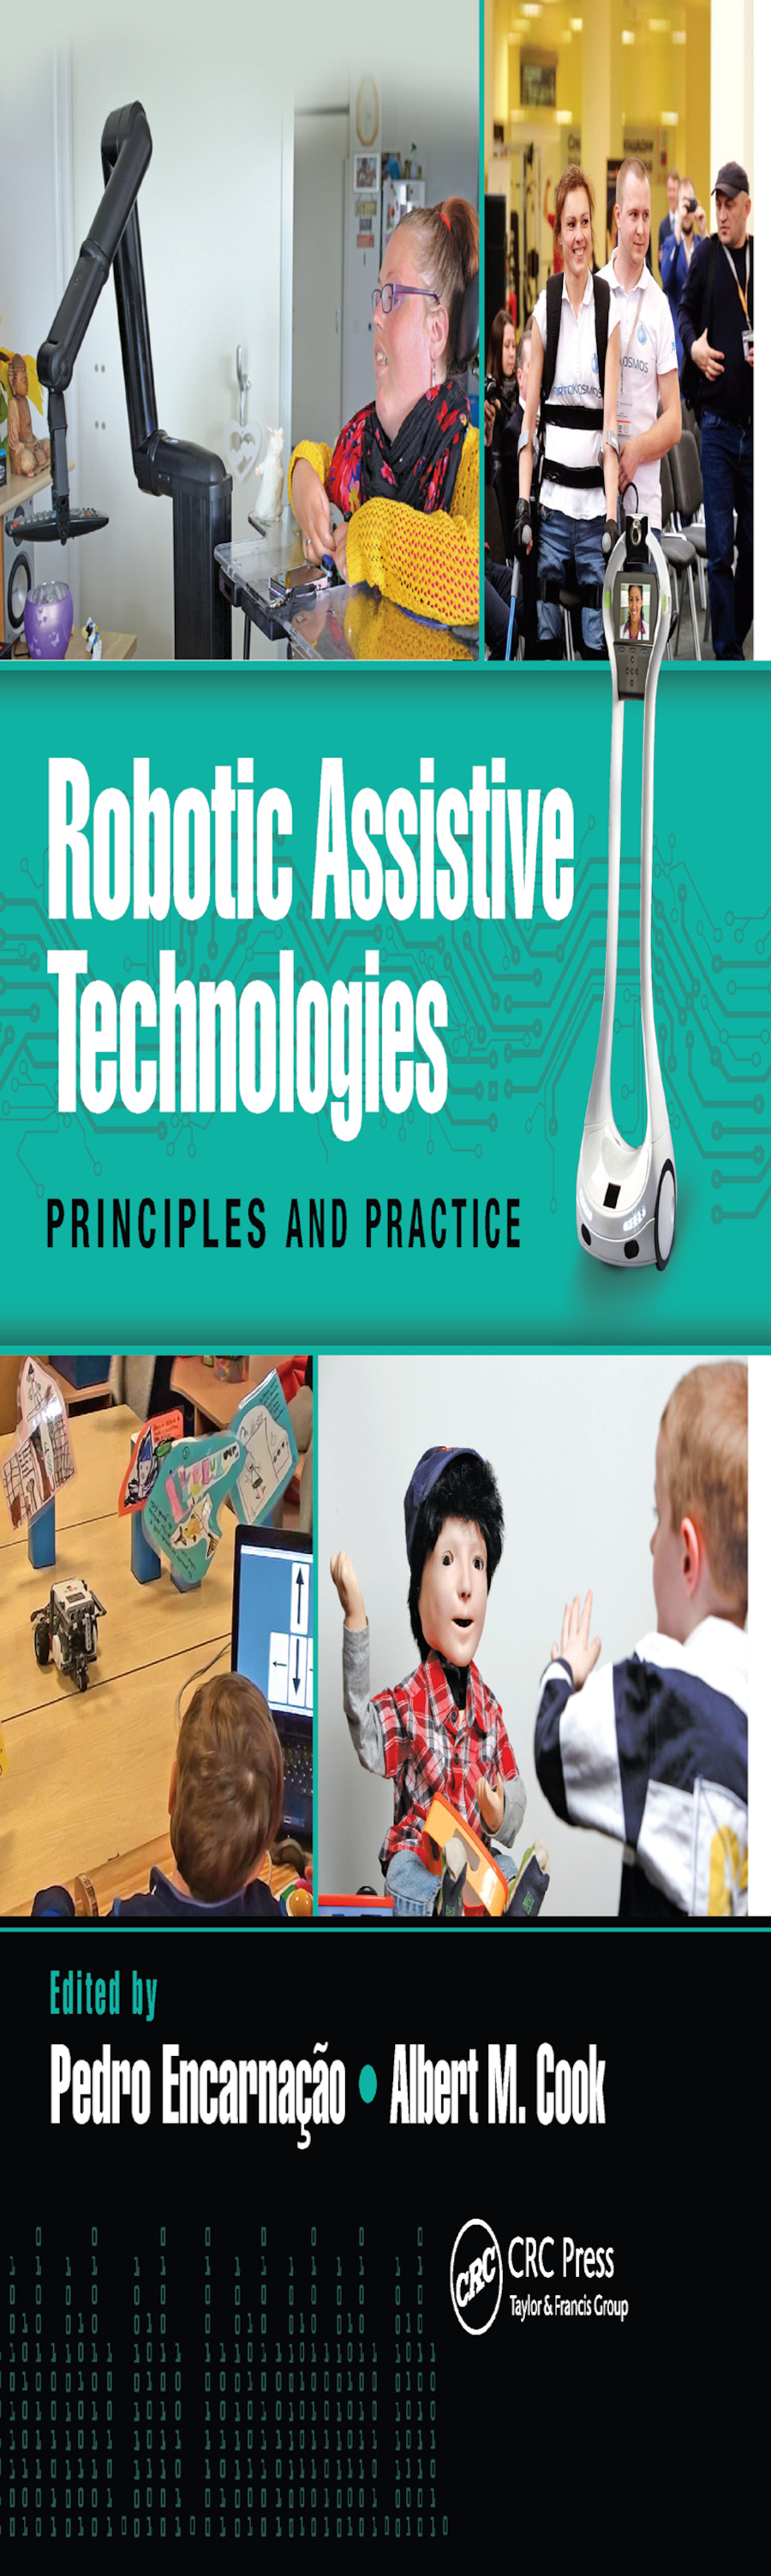 Robotic Assistive Technologies